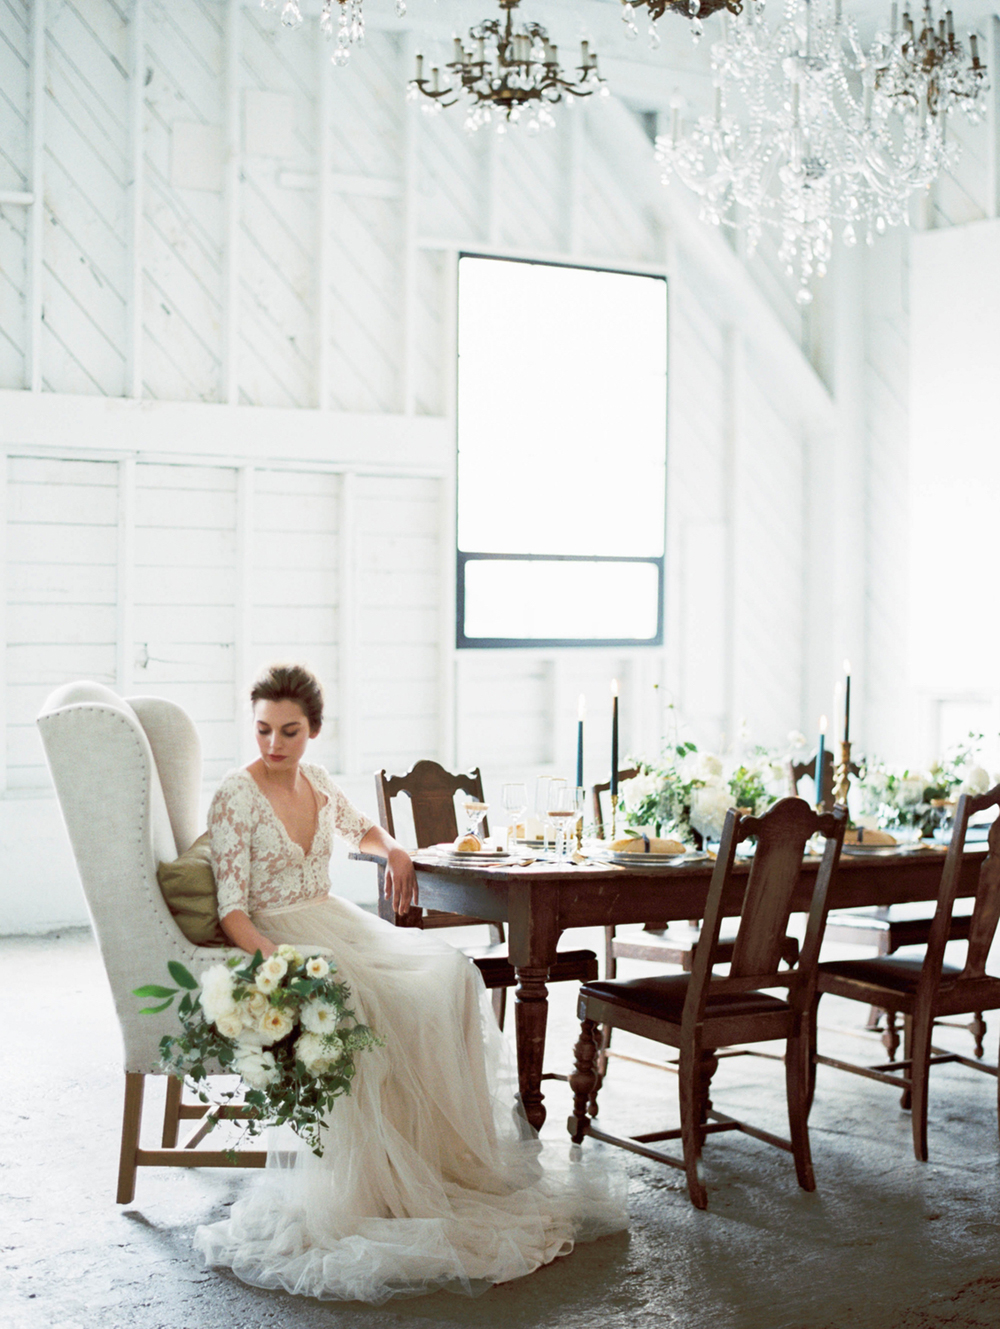 Organic Lush Wedding Inspiration with Elegant Details - photo by Maria Lamb http://ruffledblog.com/organic-lush-wedding-inspiration-with-elegant-details